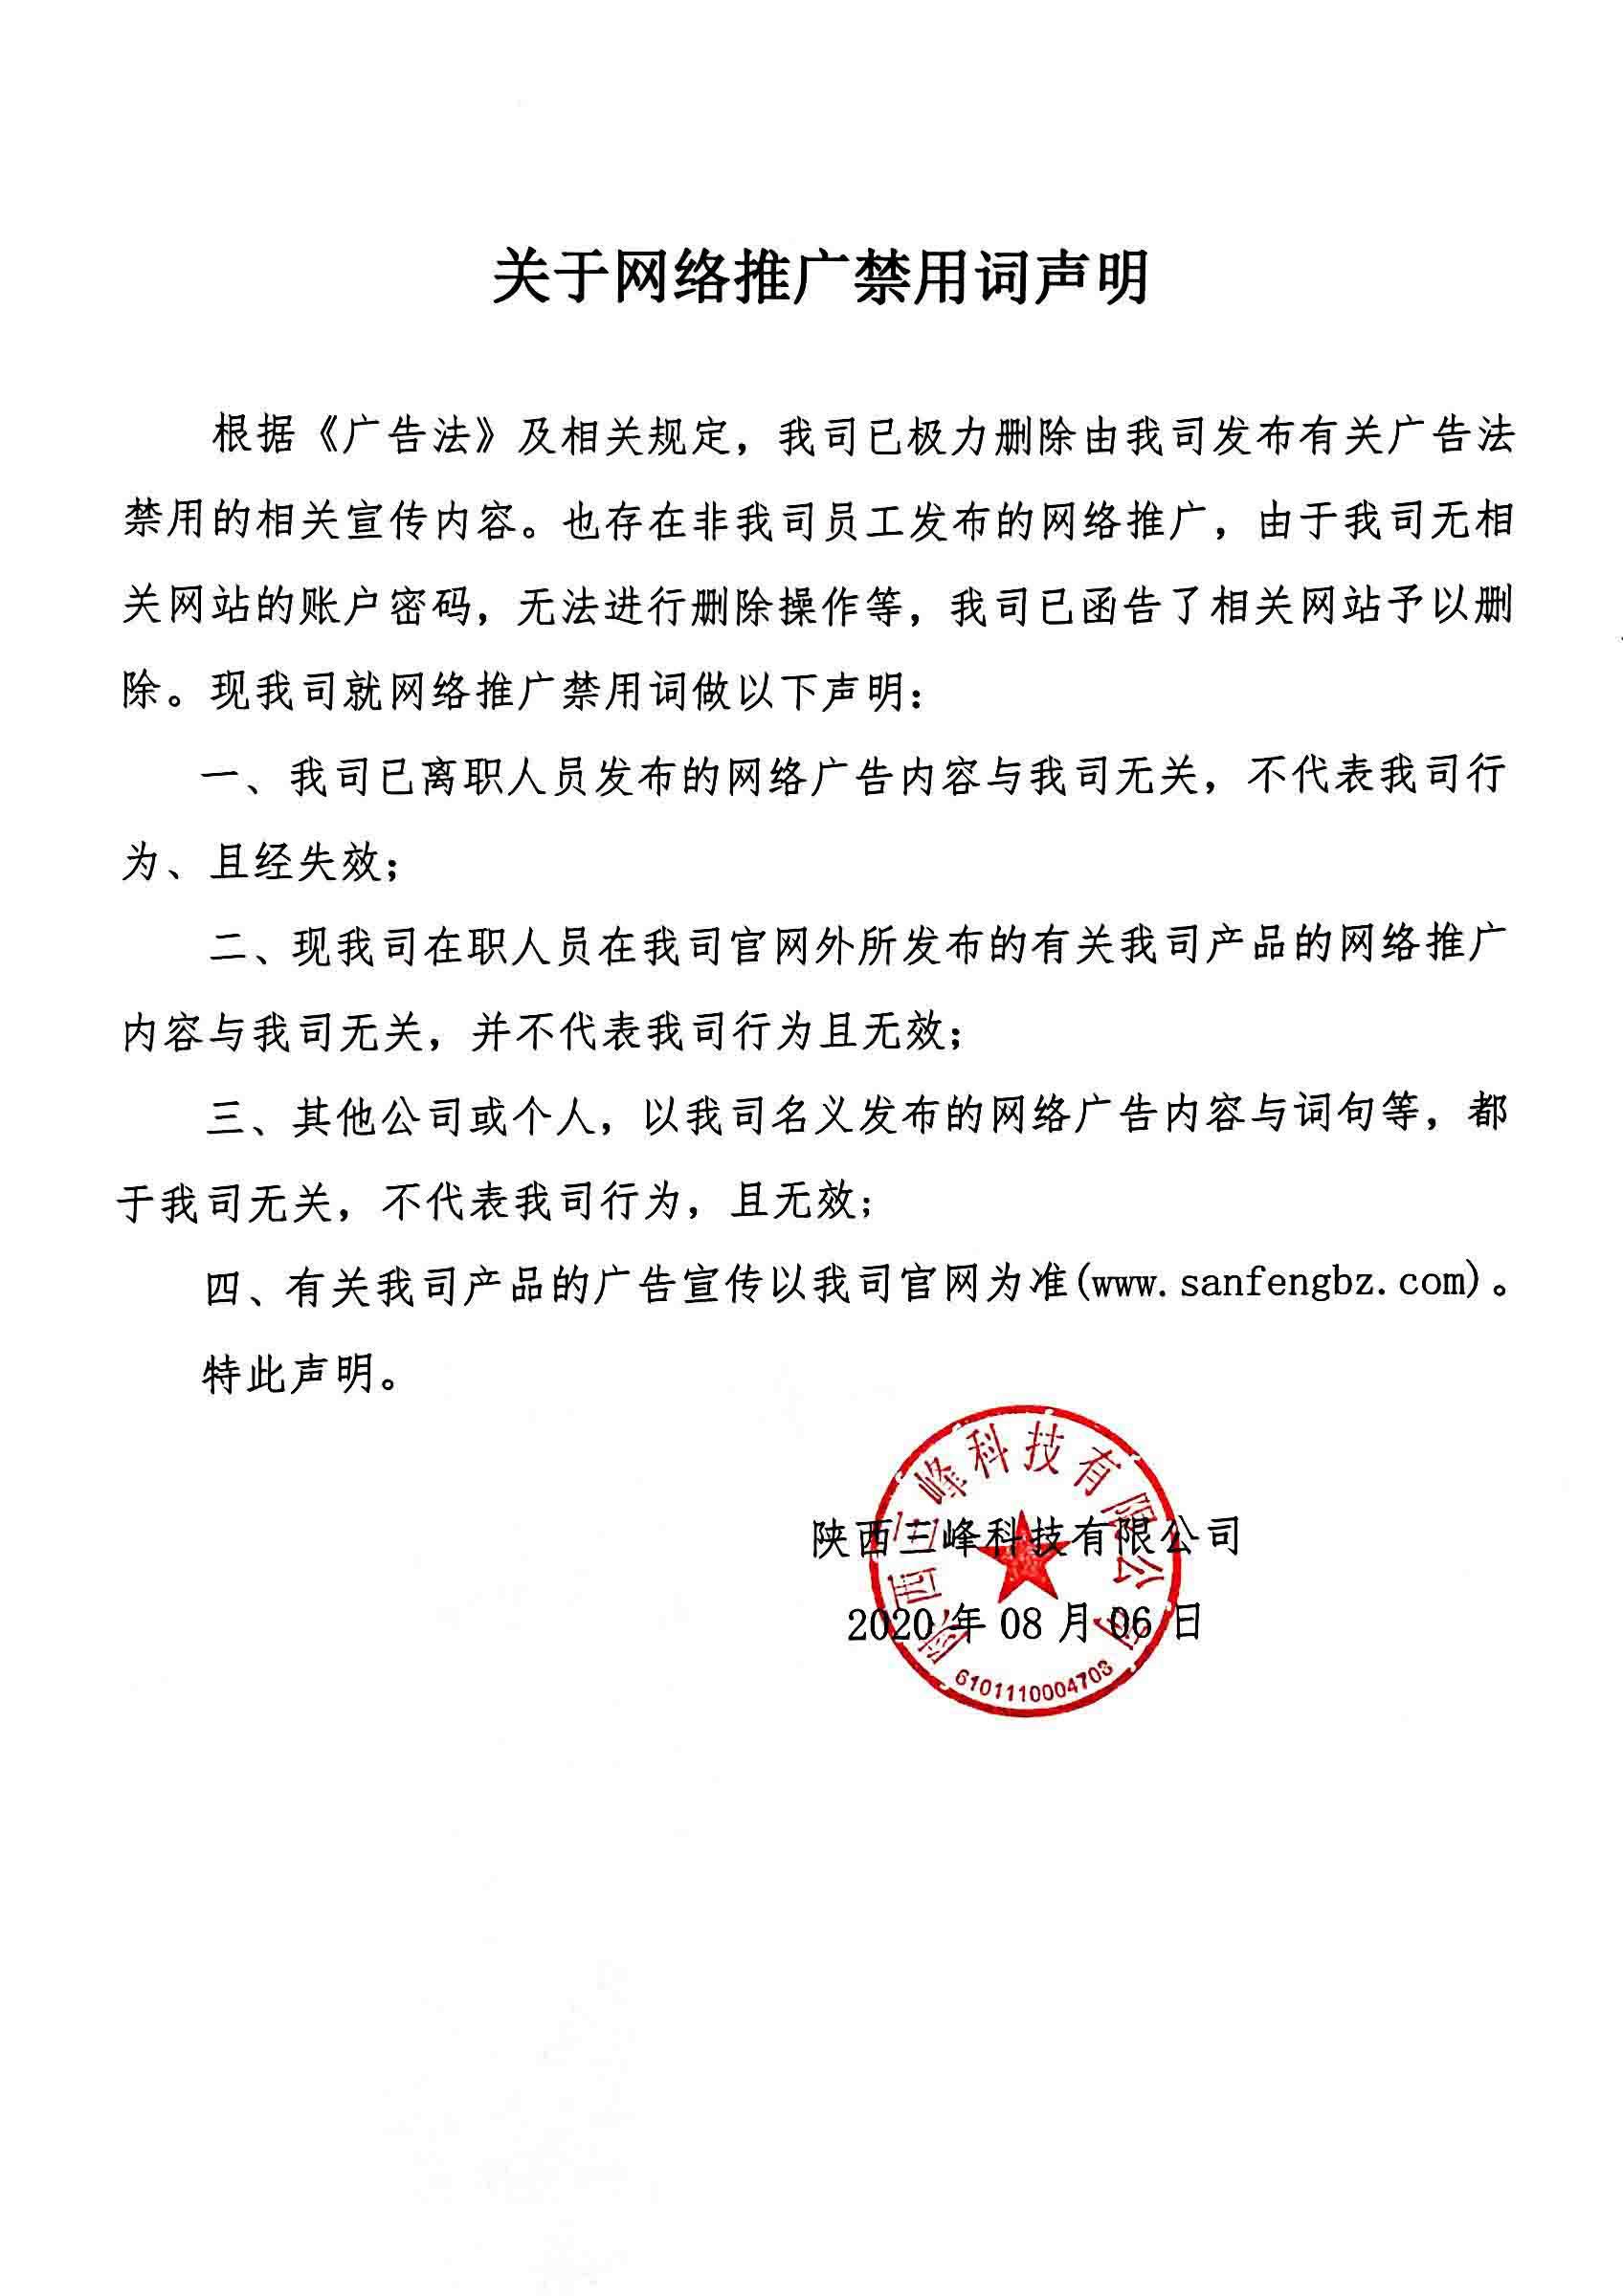 nba竞彩篮球彩票官方app篮彩投注网址厂